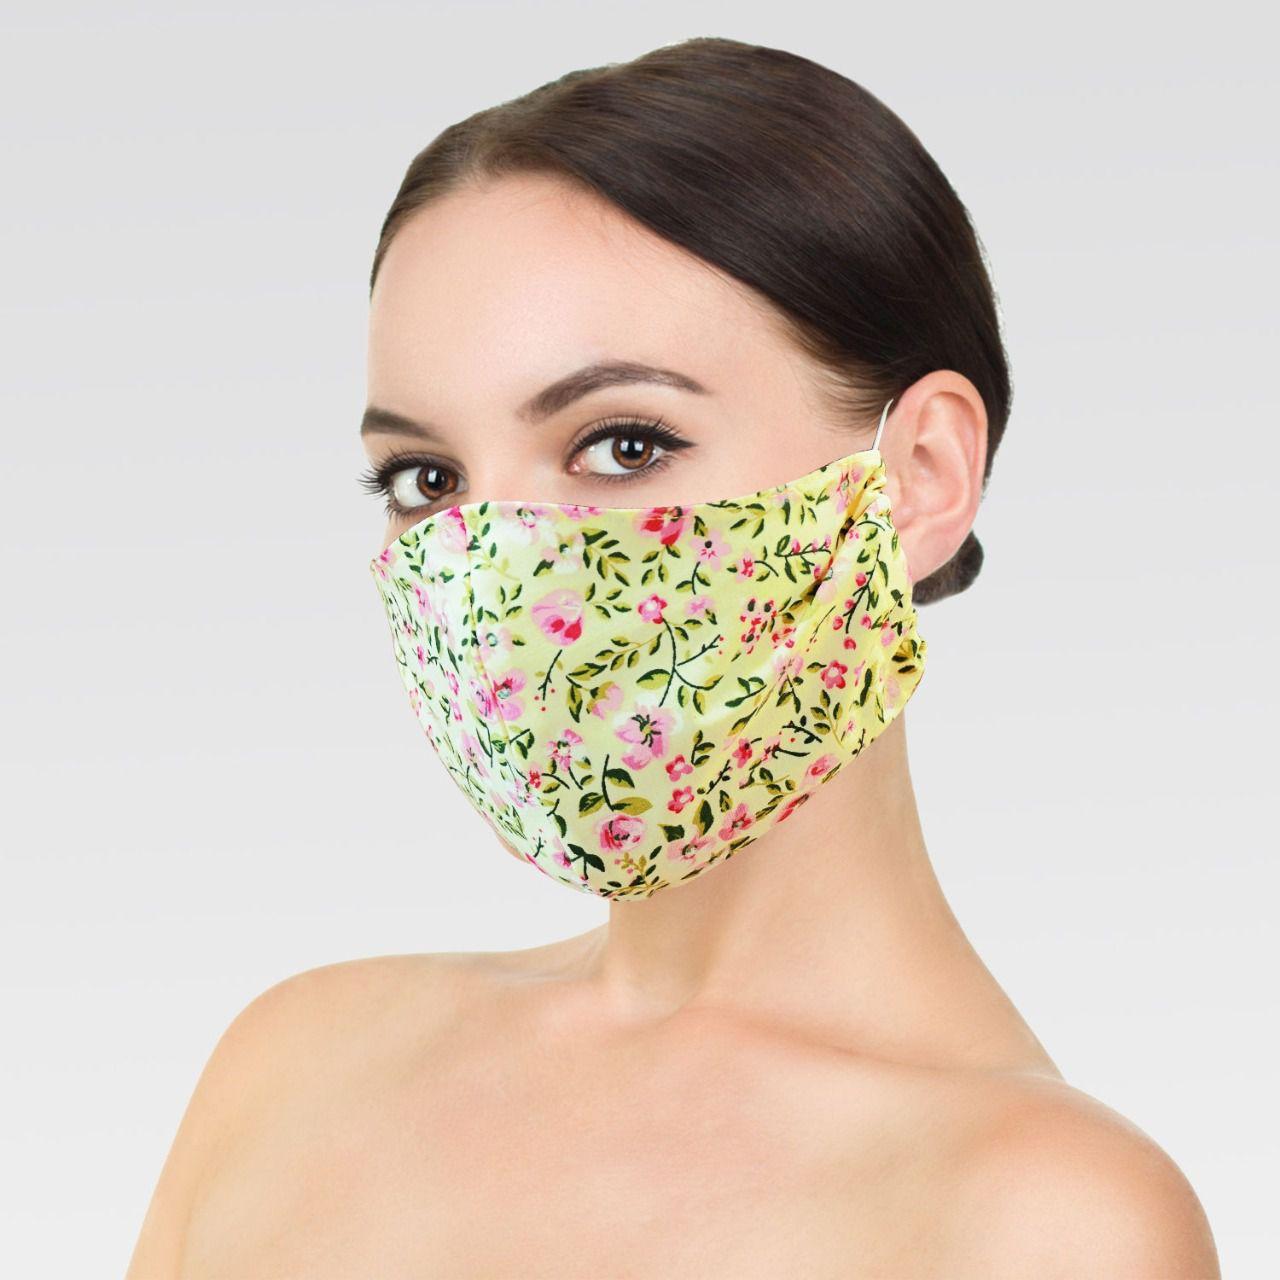 Máscara de Proteção para Imunidade - Amarelo claro